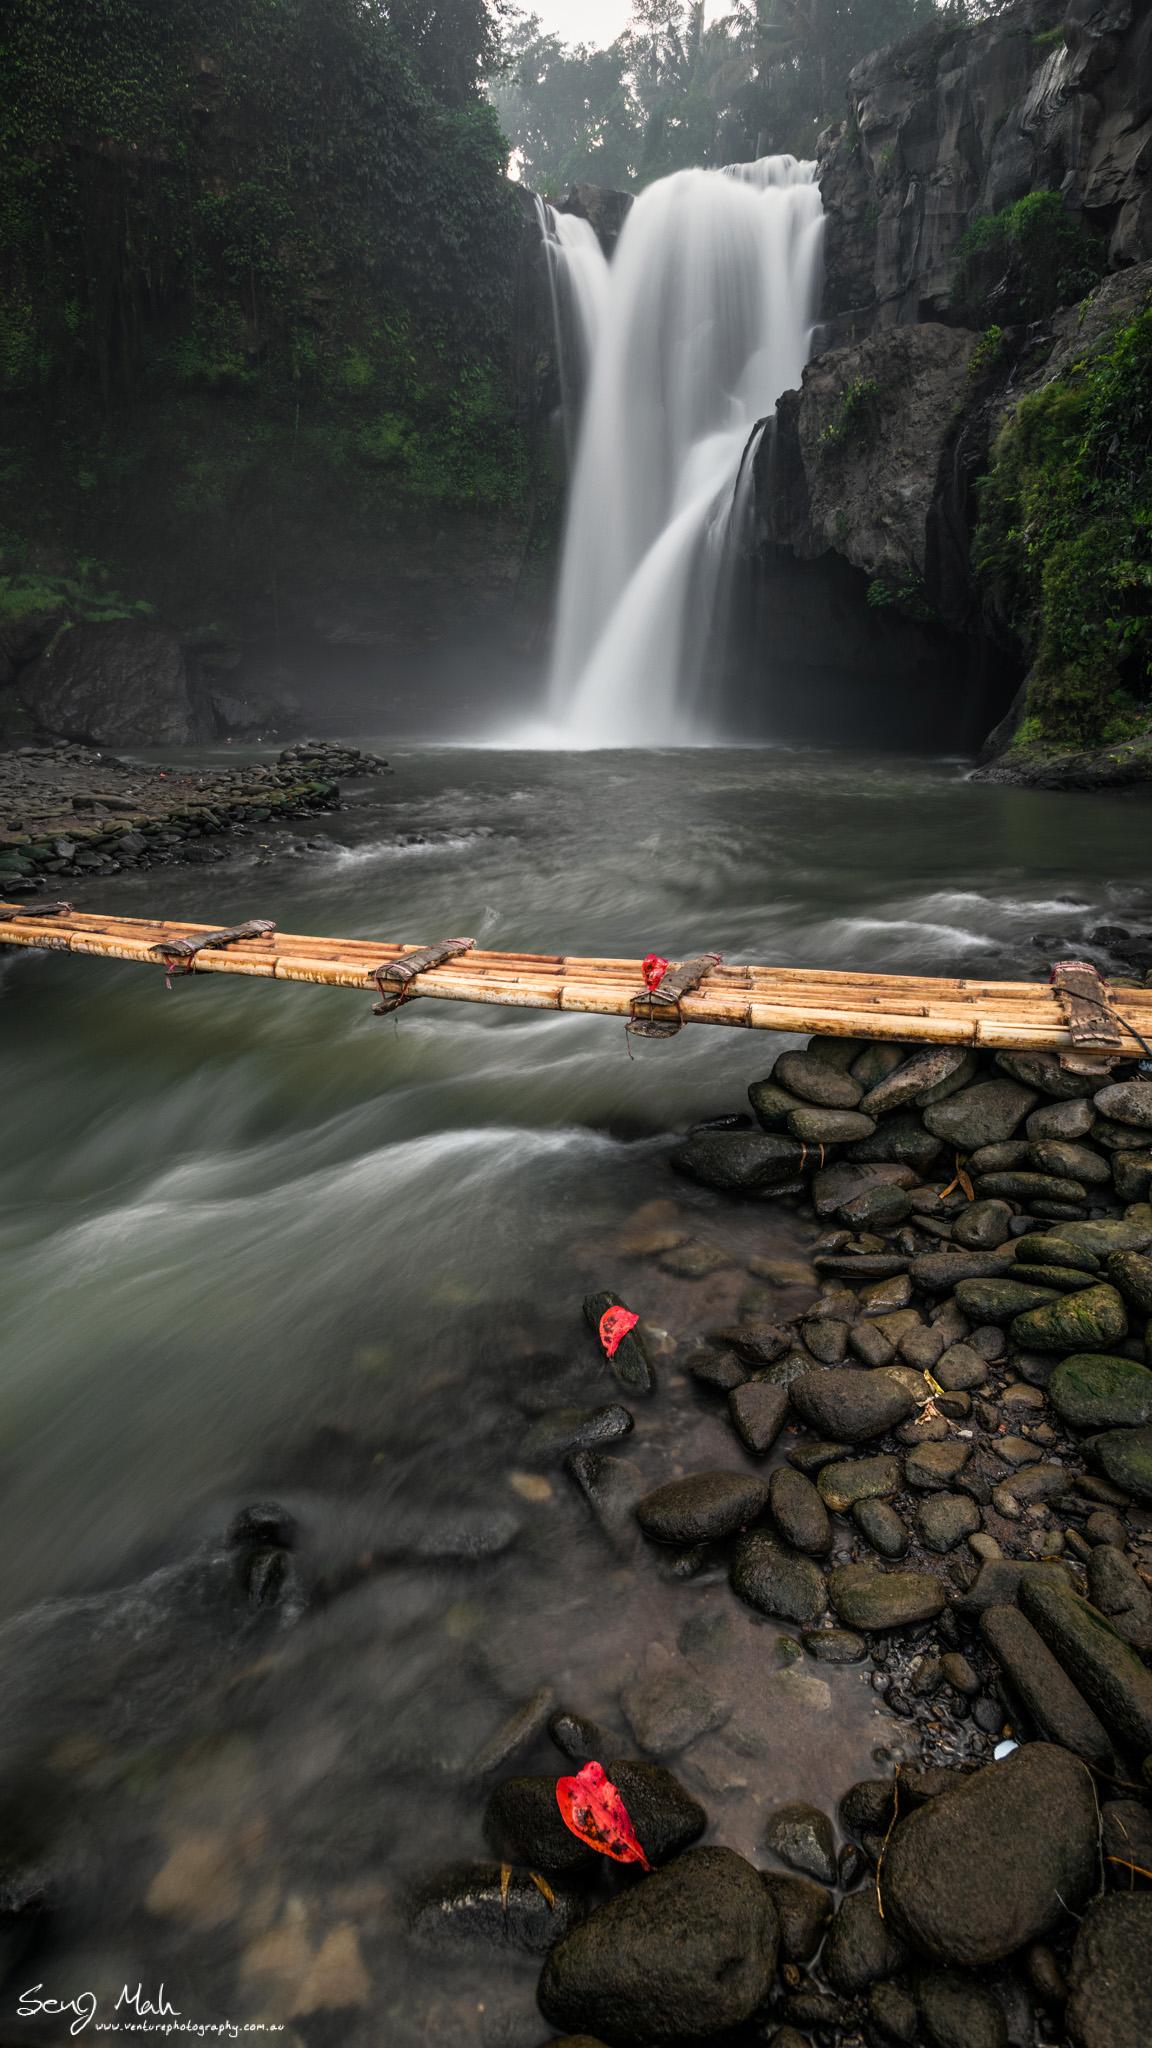 Tengunungan Falls, Bali